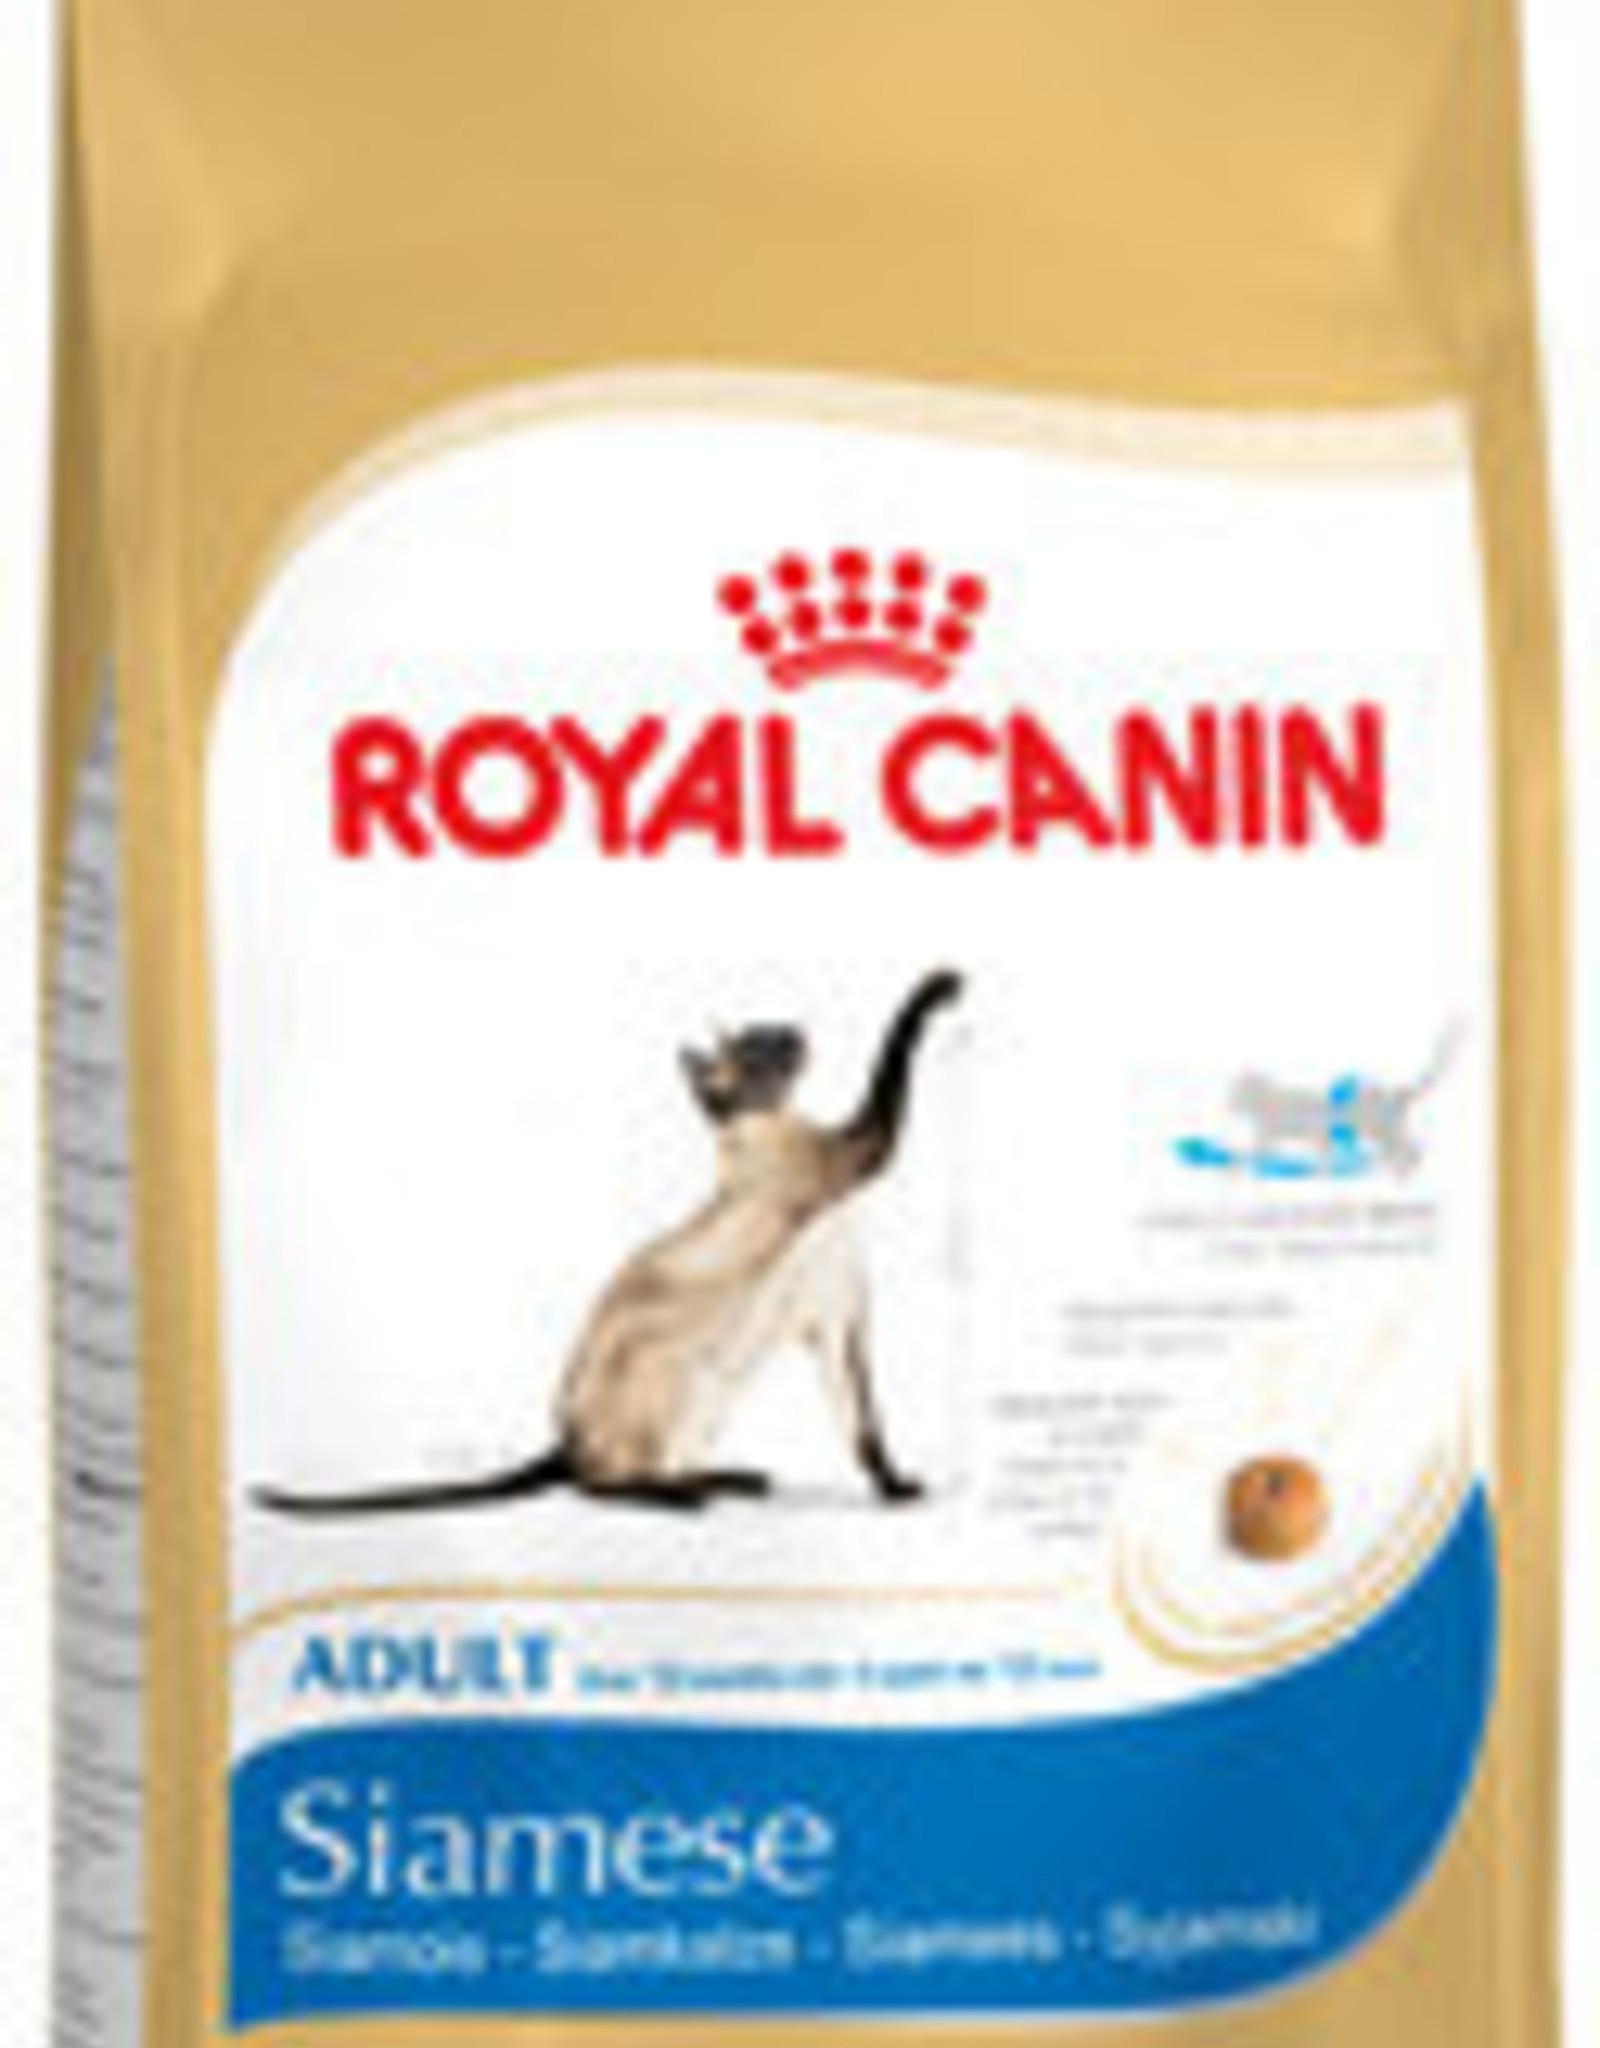 Royal Canin Royal Canin Fbn Siamese 38 2kg